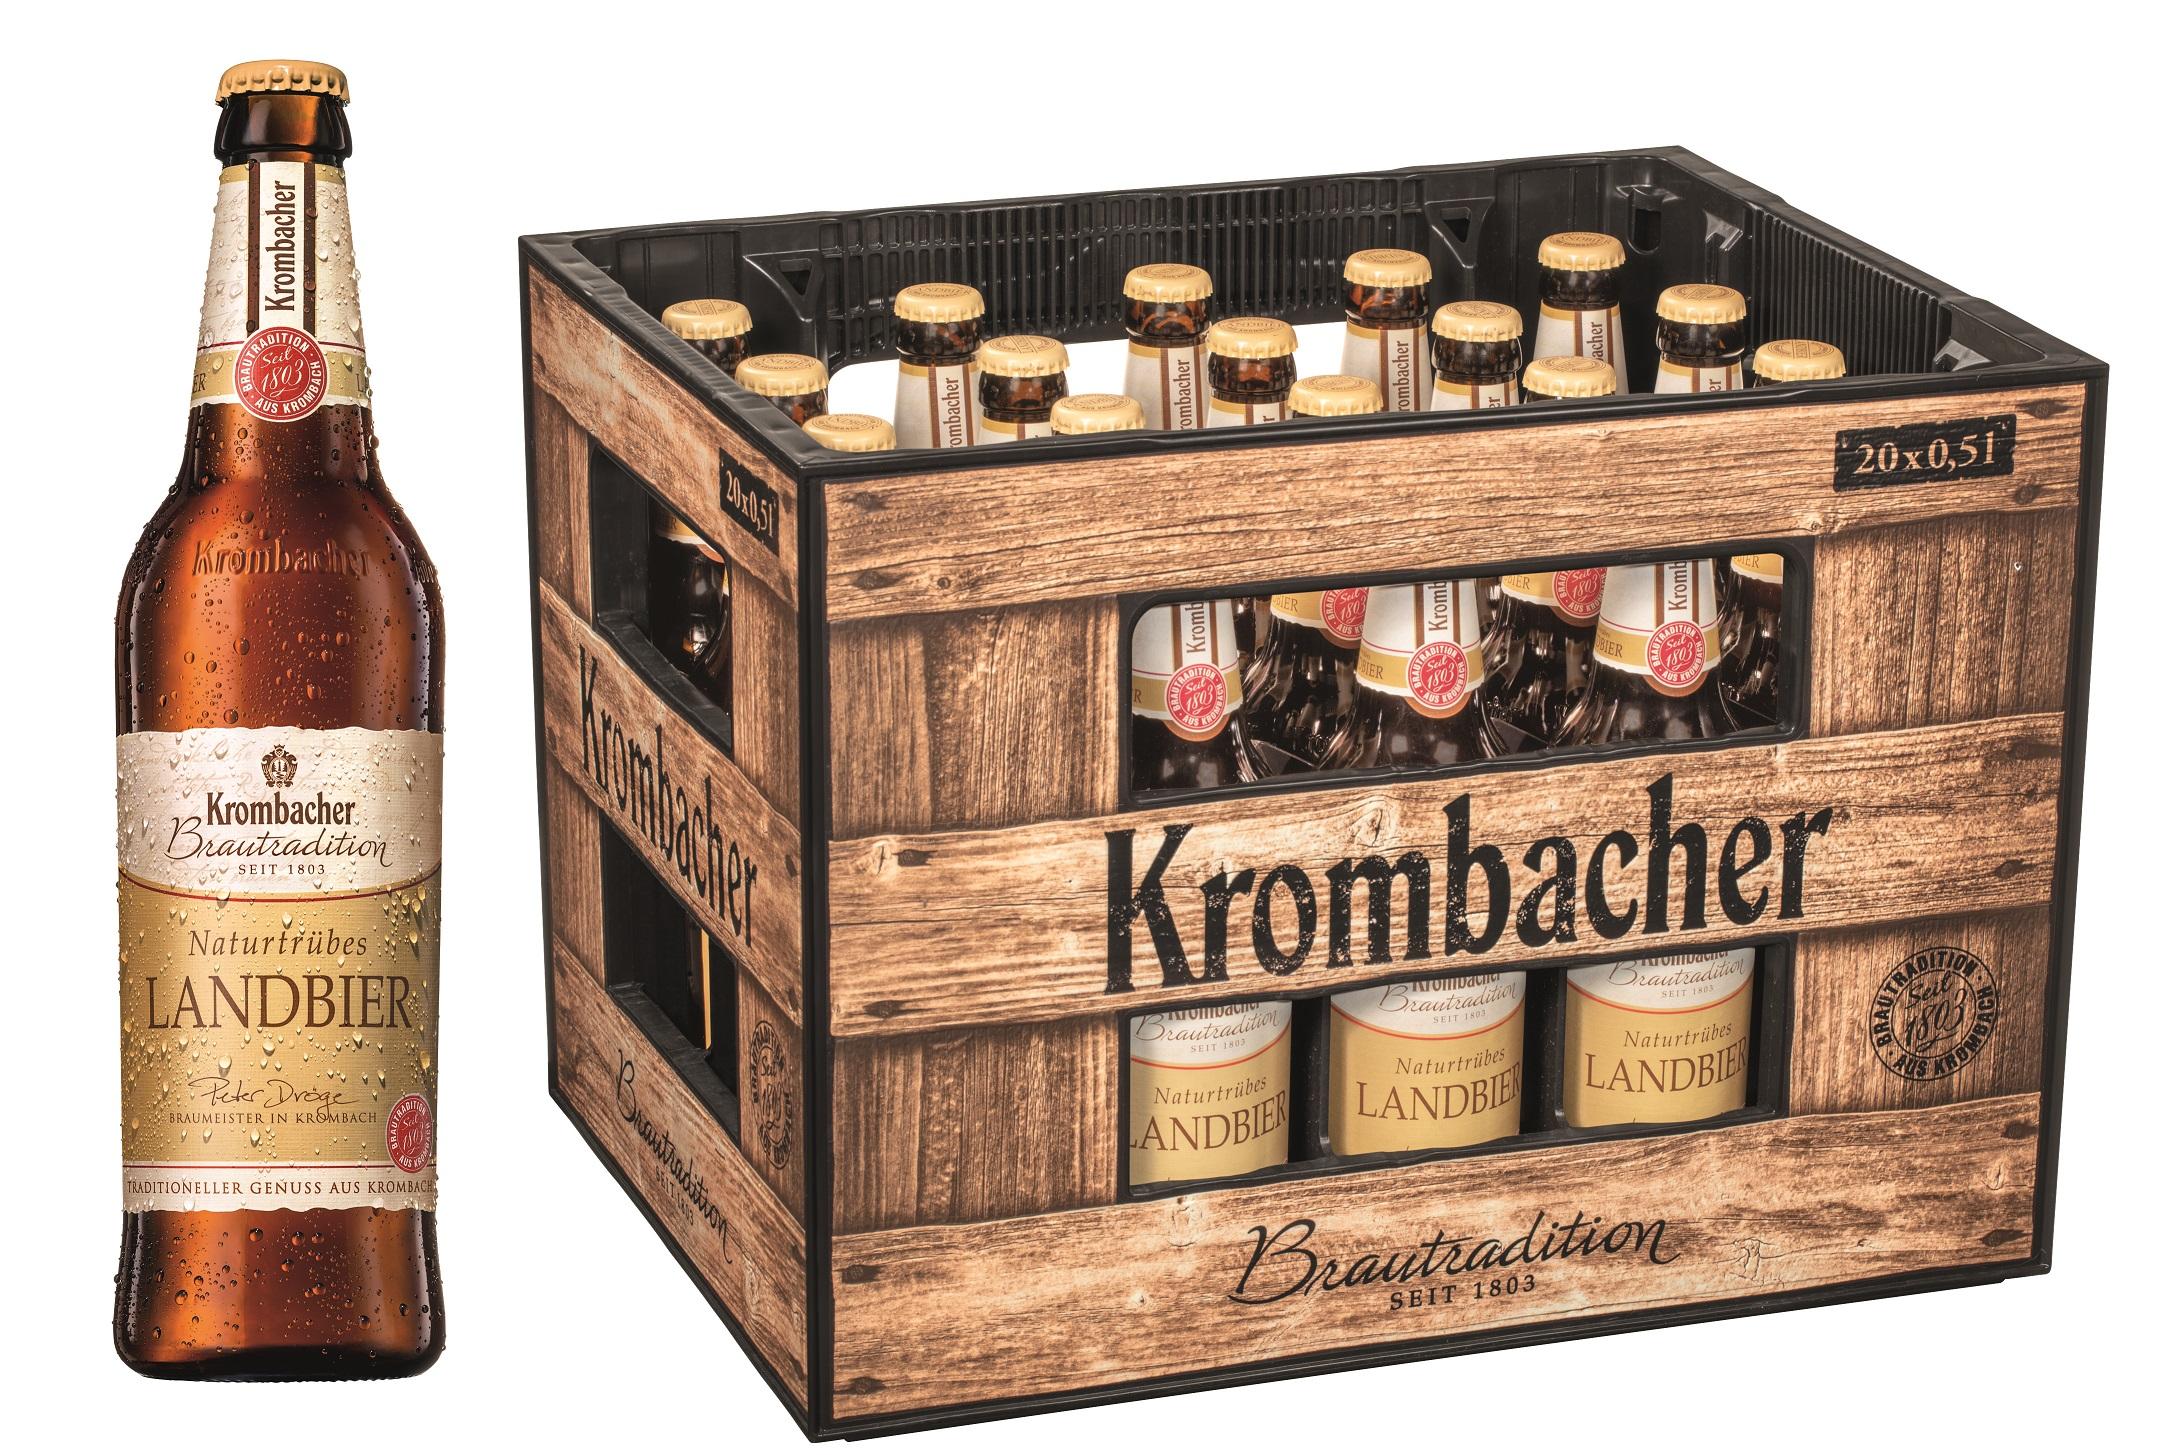 Krombacher Brautradition Landbier